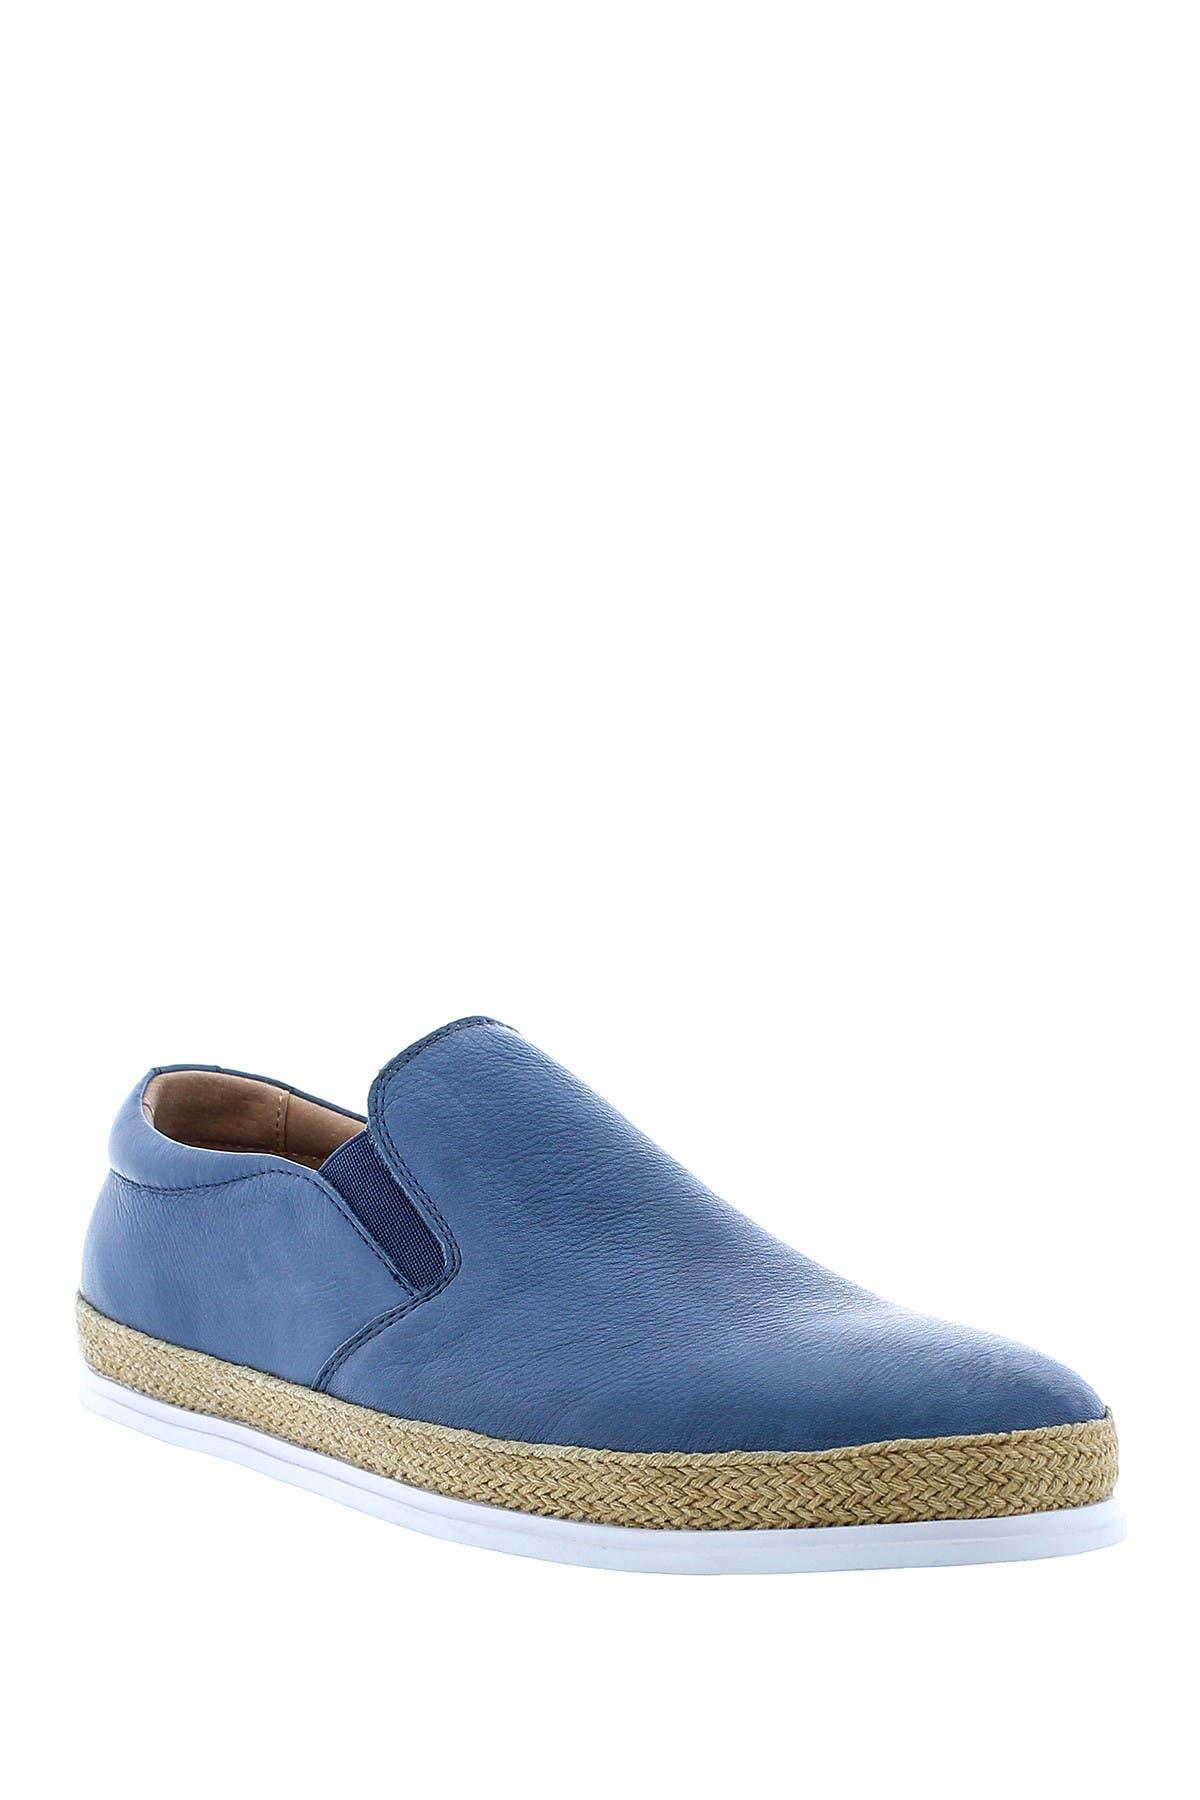 Zanzara Brielle Leather Slip-On Shoe